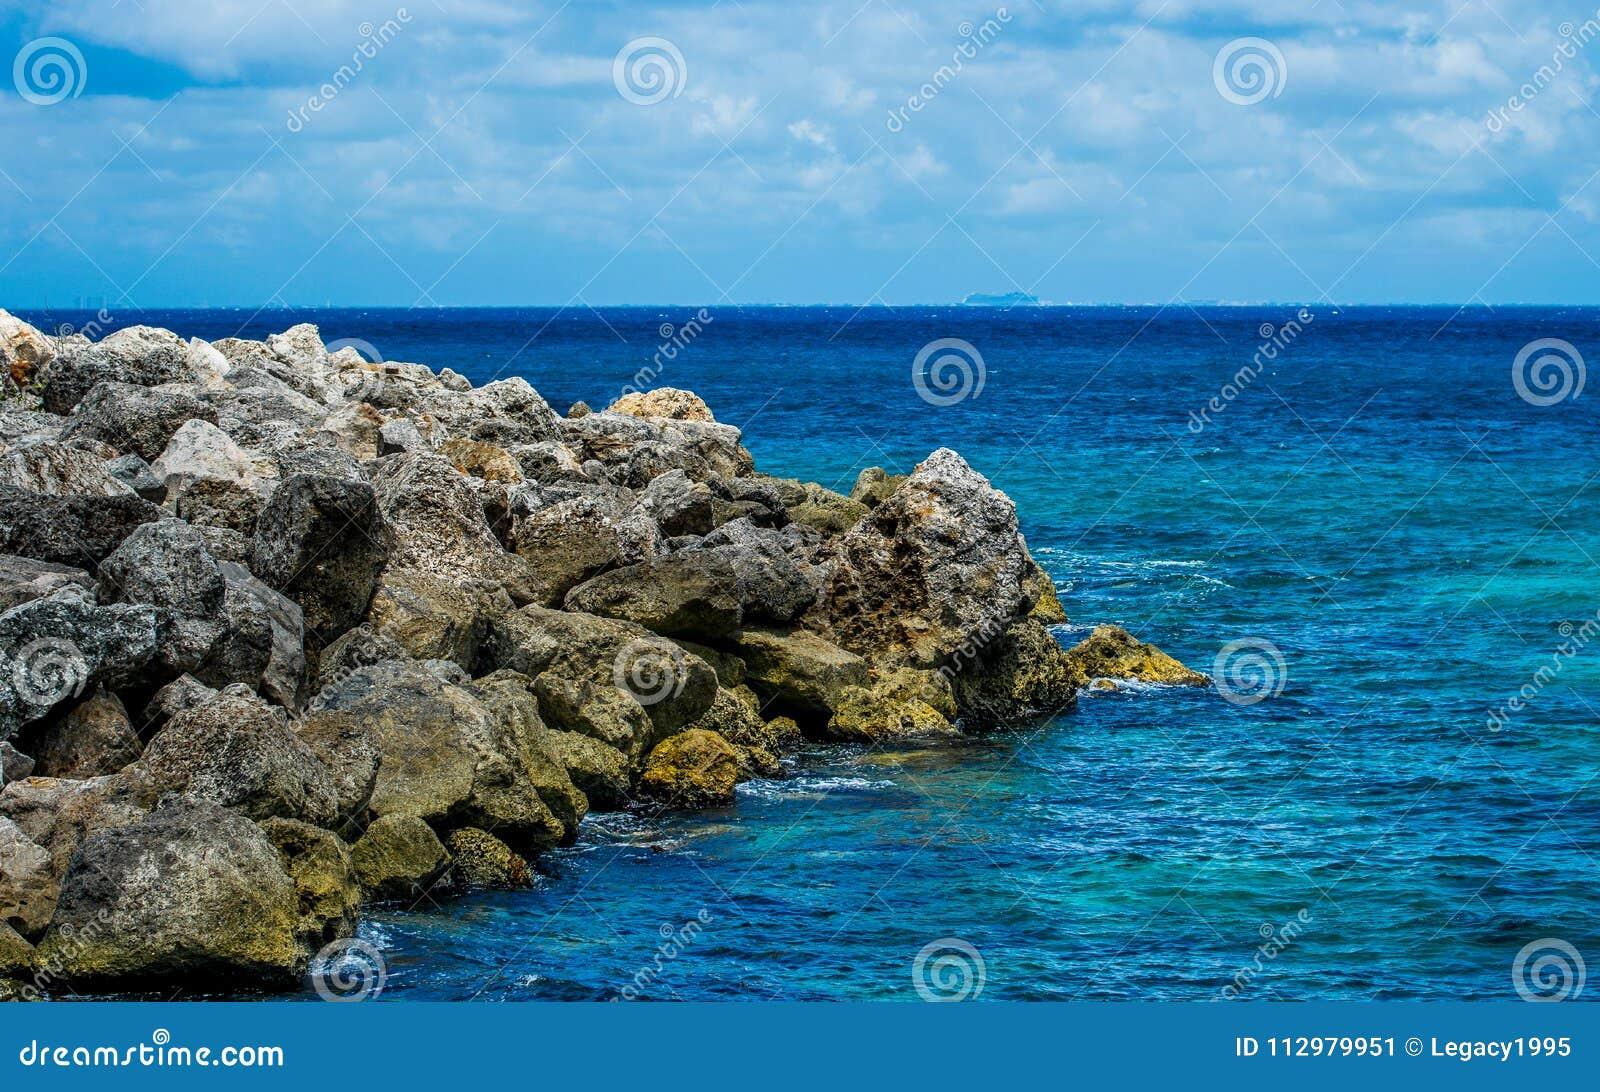 A Rocky Caribbean Coastline in Mexico